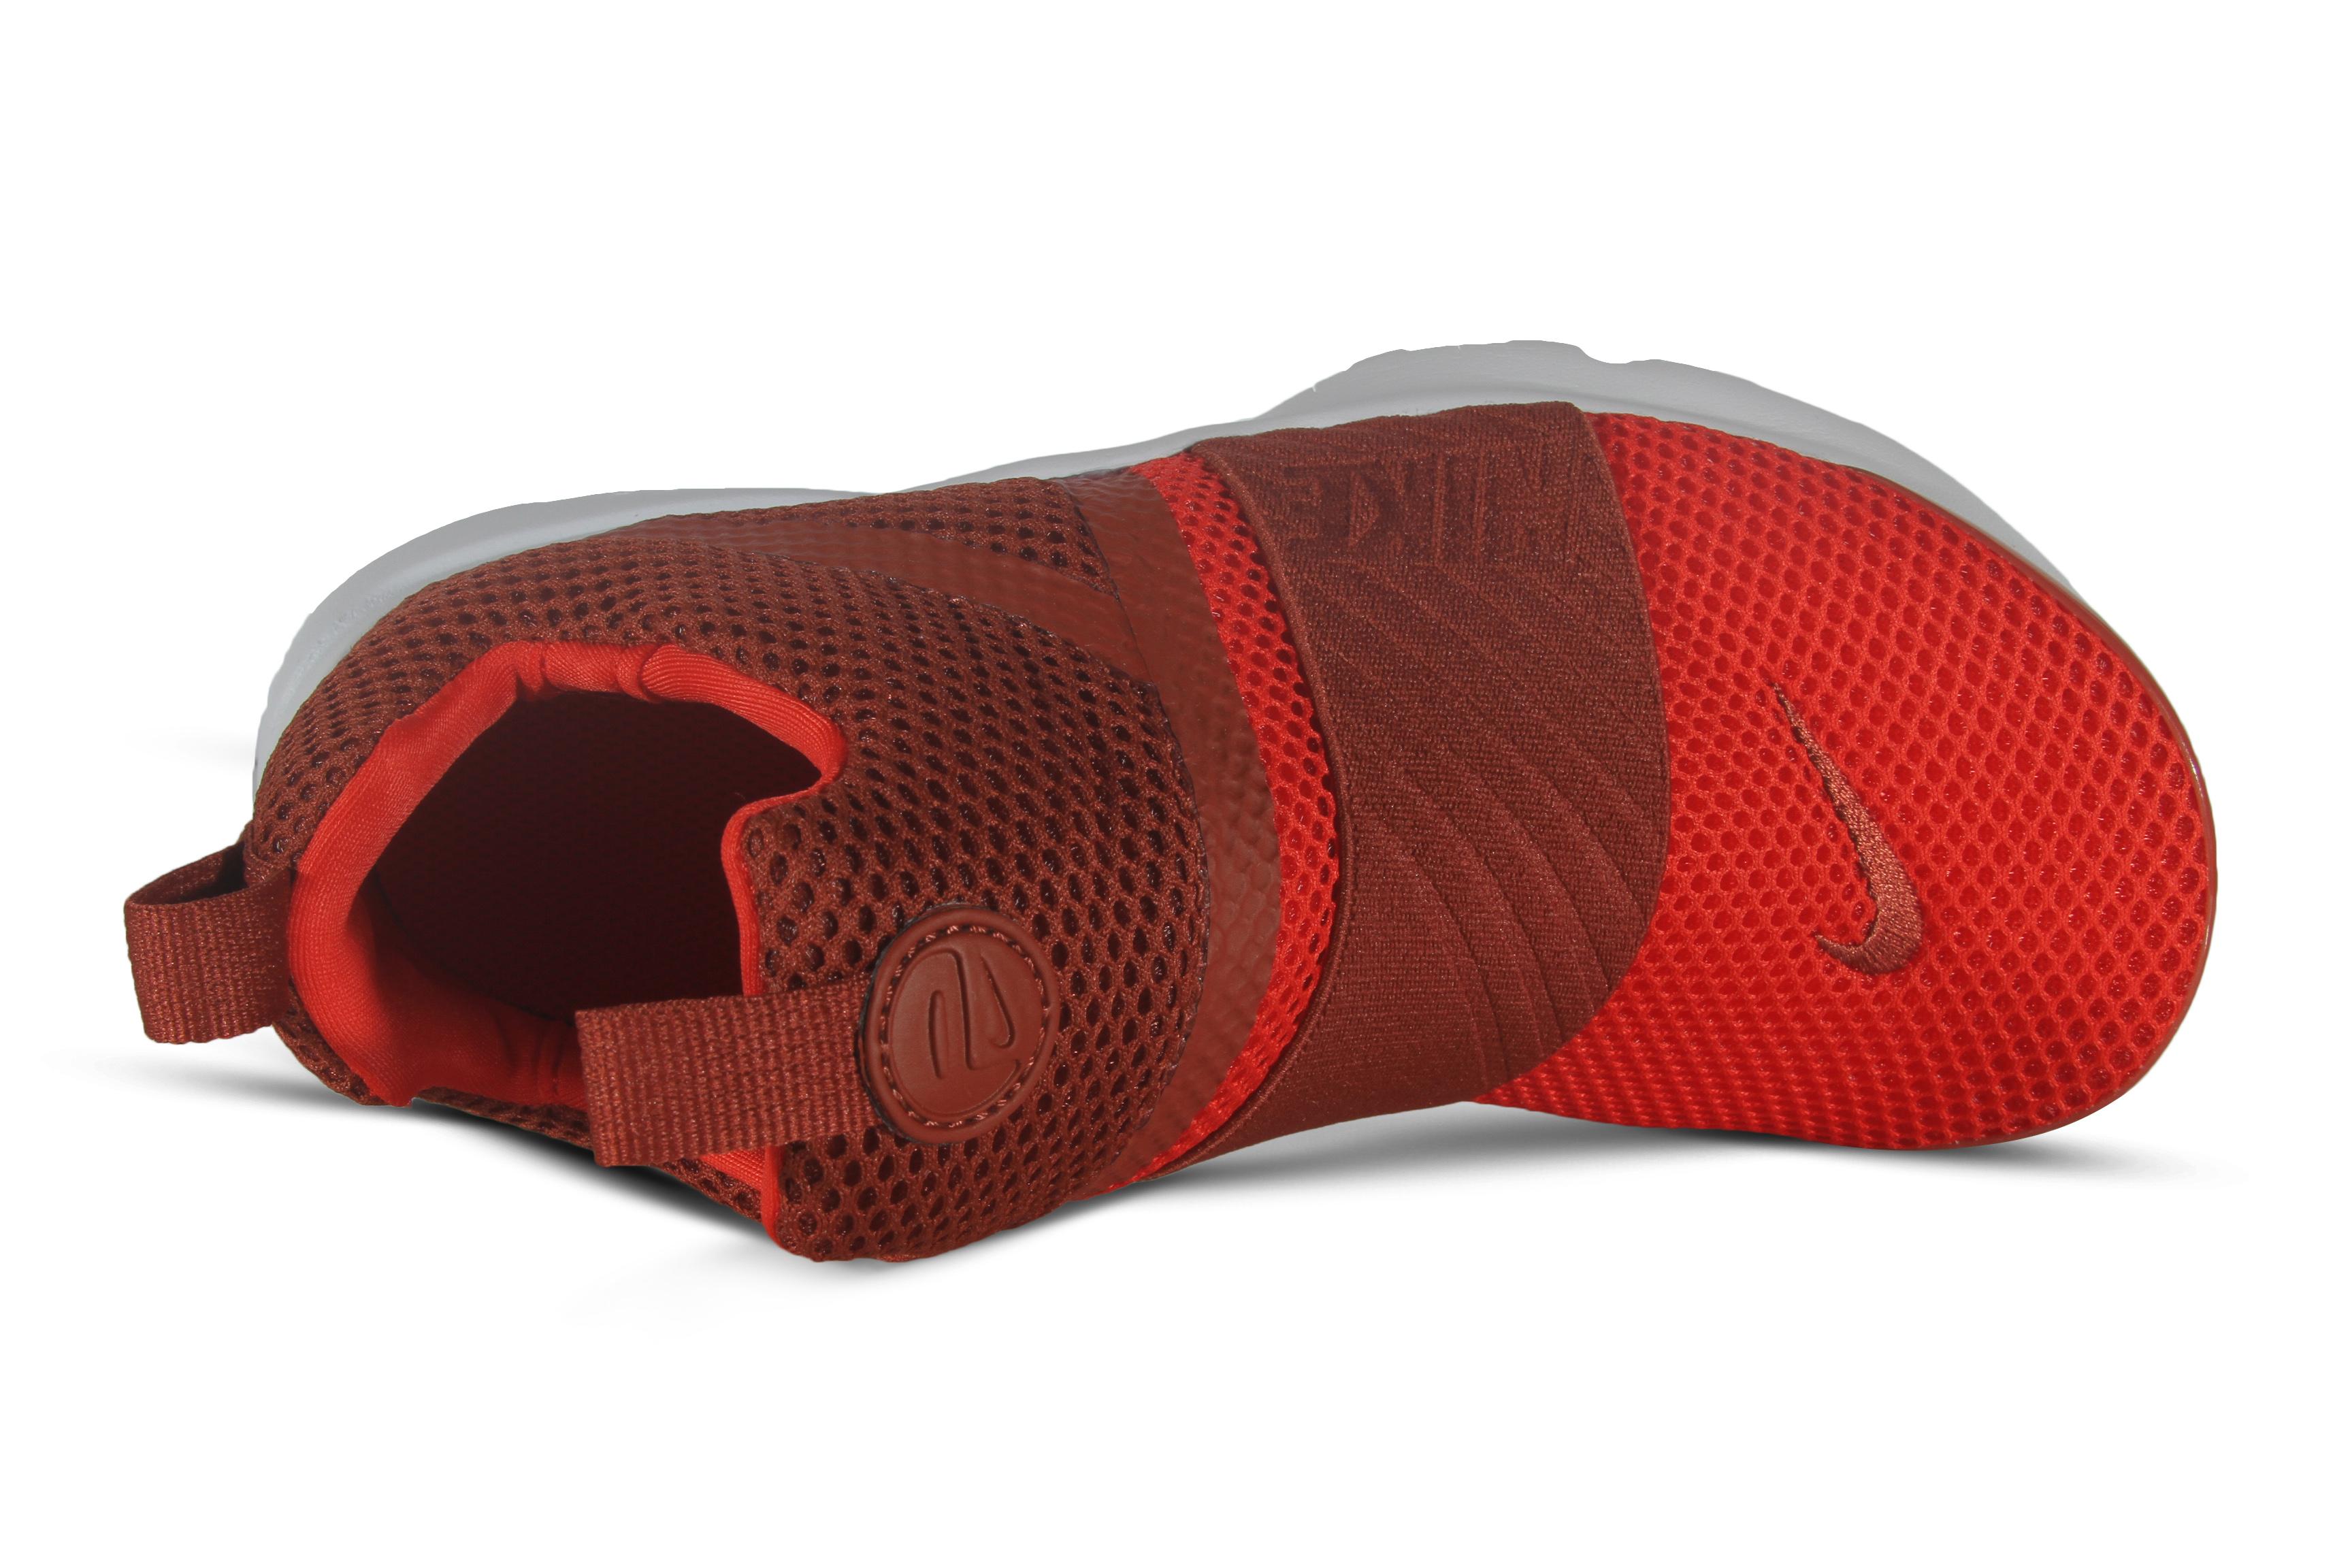 0fa770b83108 Nike Presto Extreme (PS) Boy s Pre-School (Little Kids) Running Shoes 870023 -604